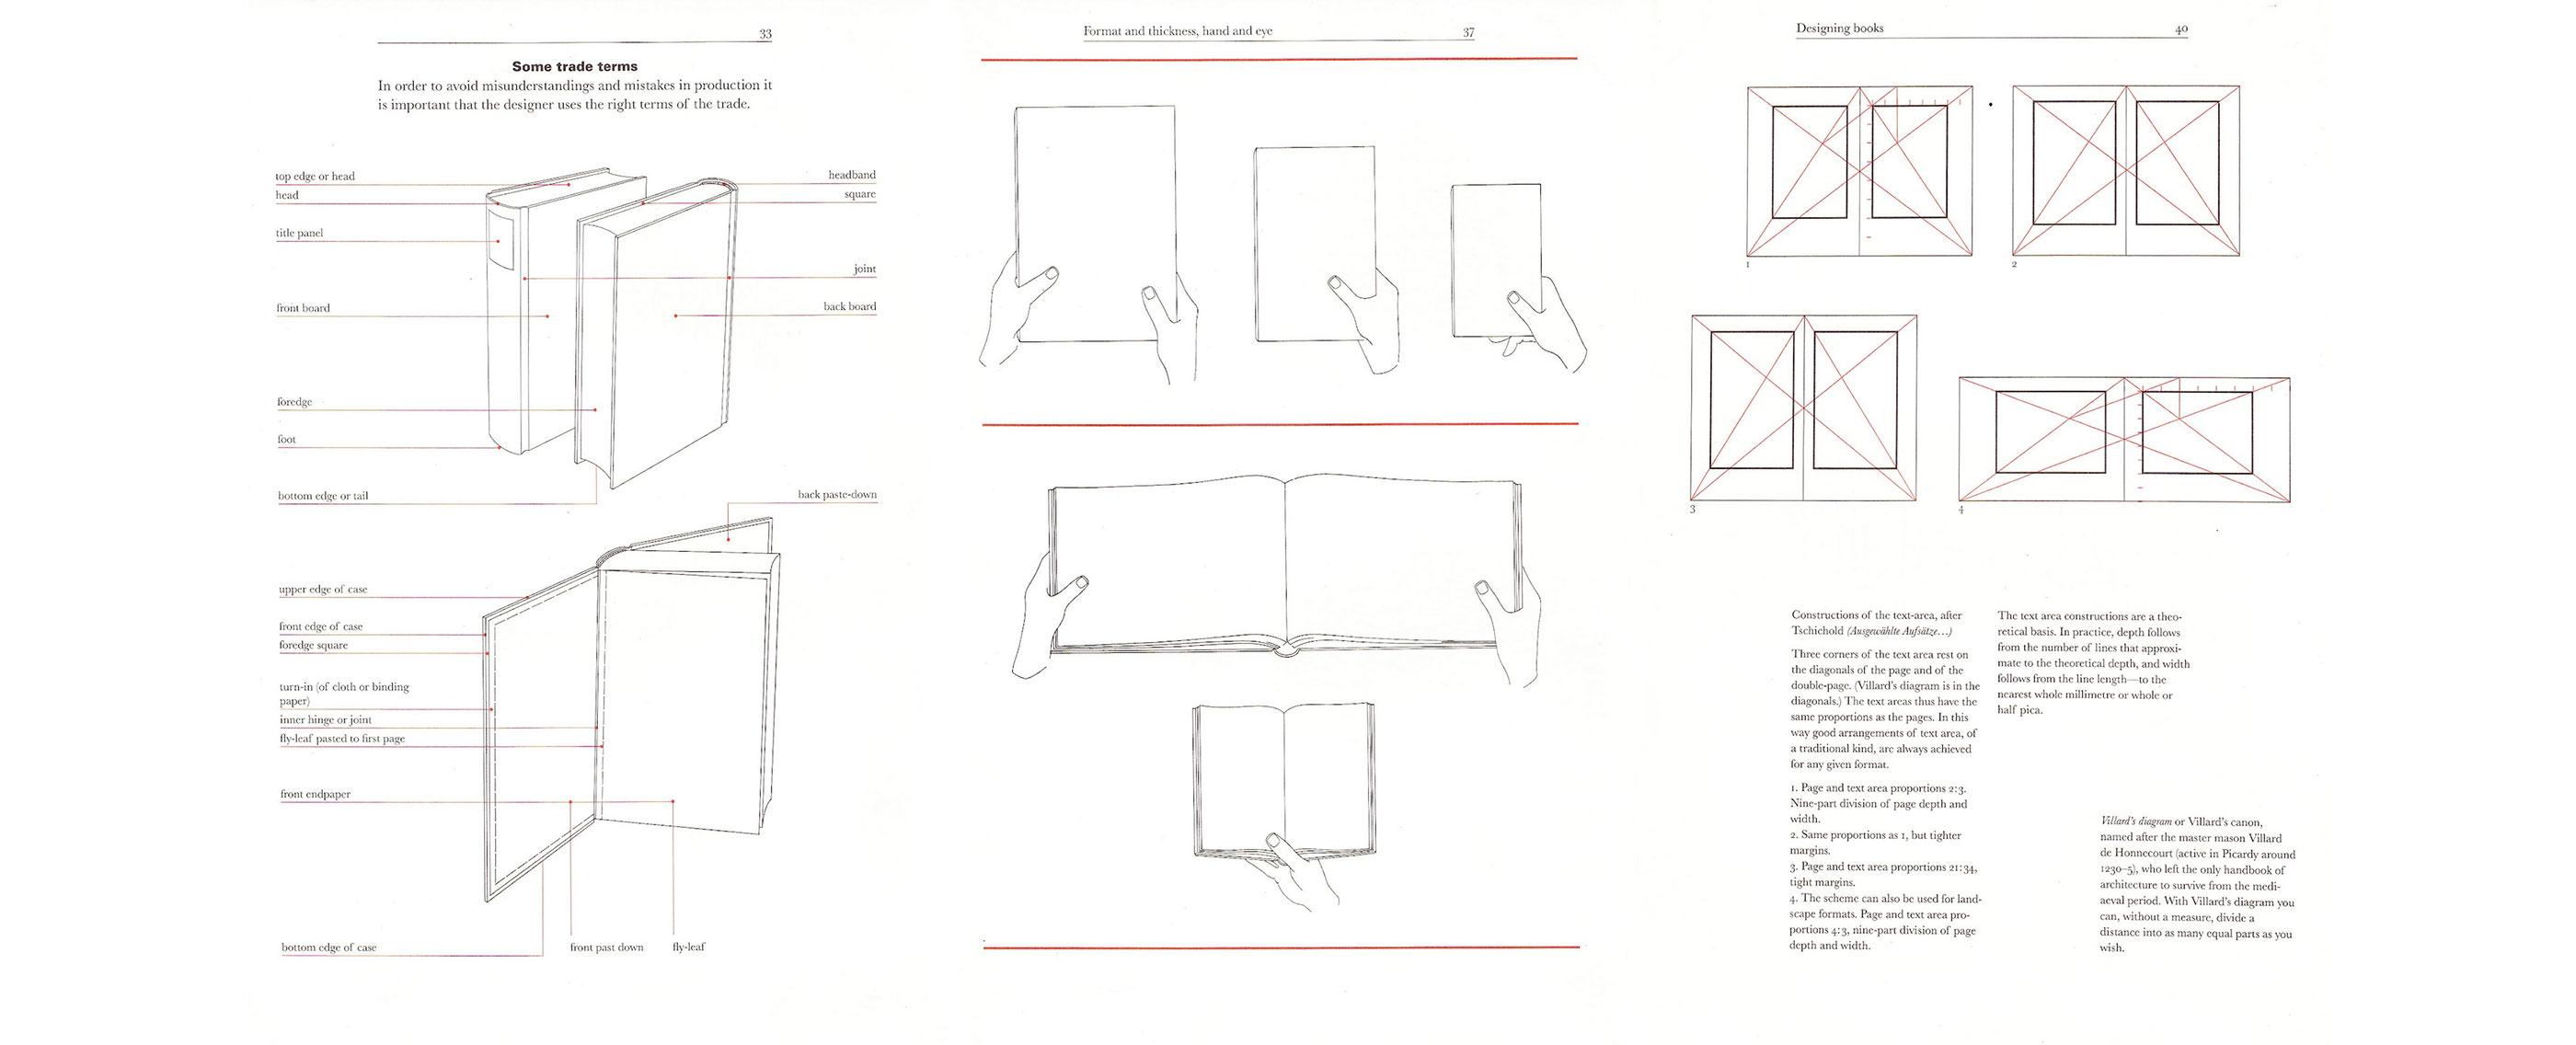 Jost-Hochuli-CH-designing-books